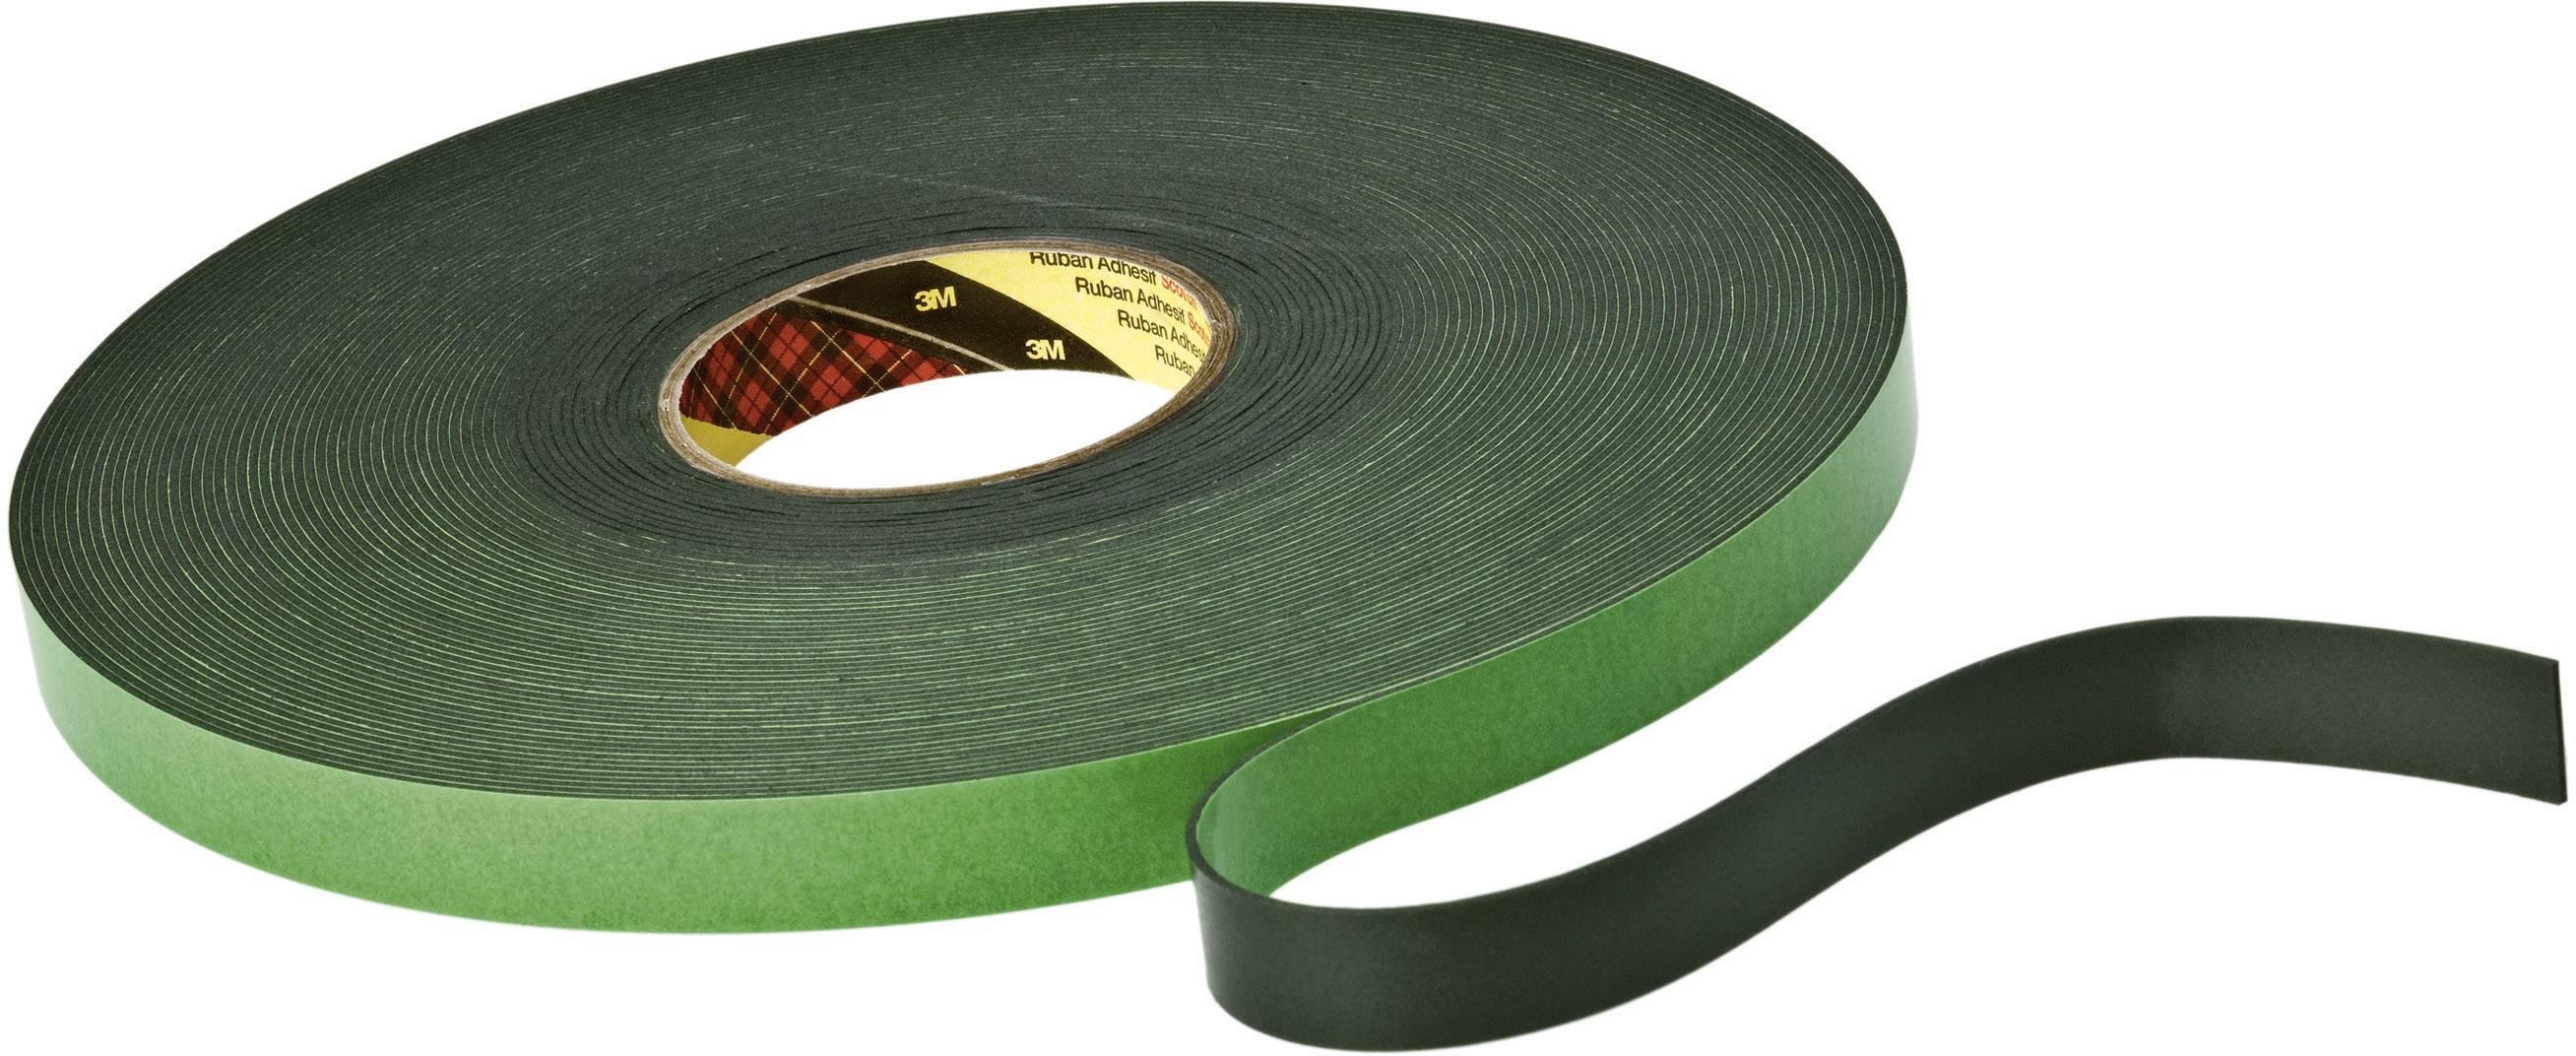 Obojstranná lepiaca páska 3M 9515B KT777306210, (d x š) 33 m x 12 mm, čierna, 1 roliek